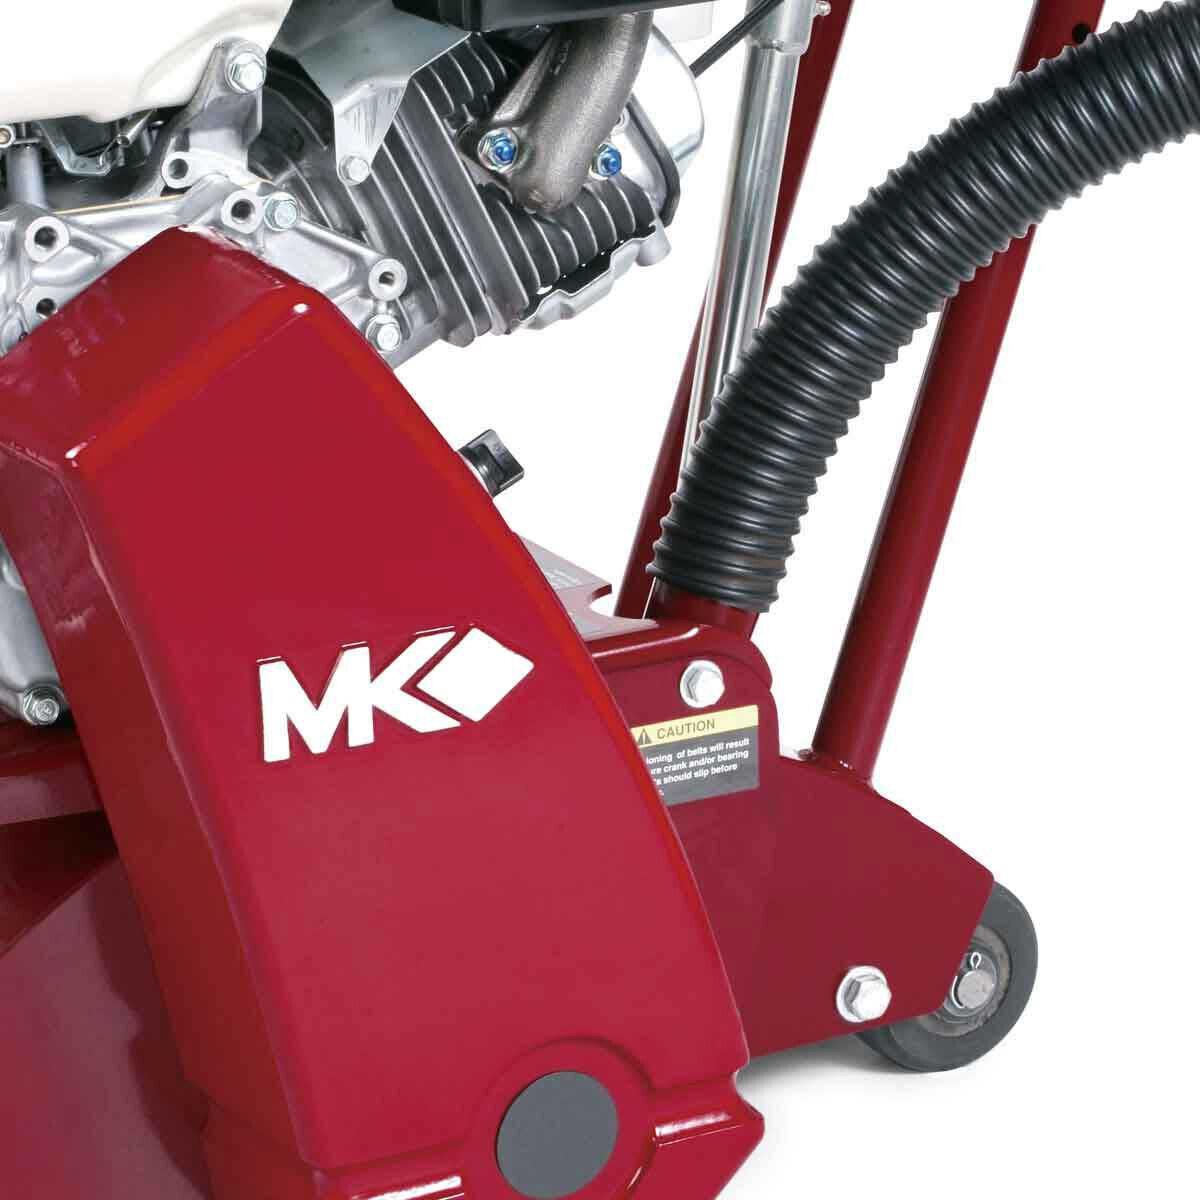 MK Diamond Scarifier with Vacuum Port